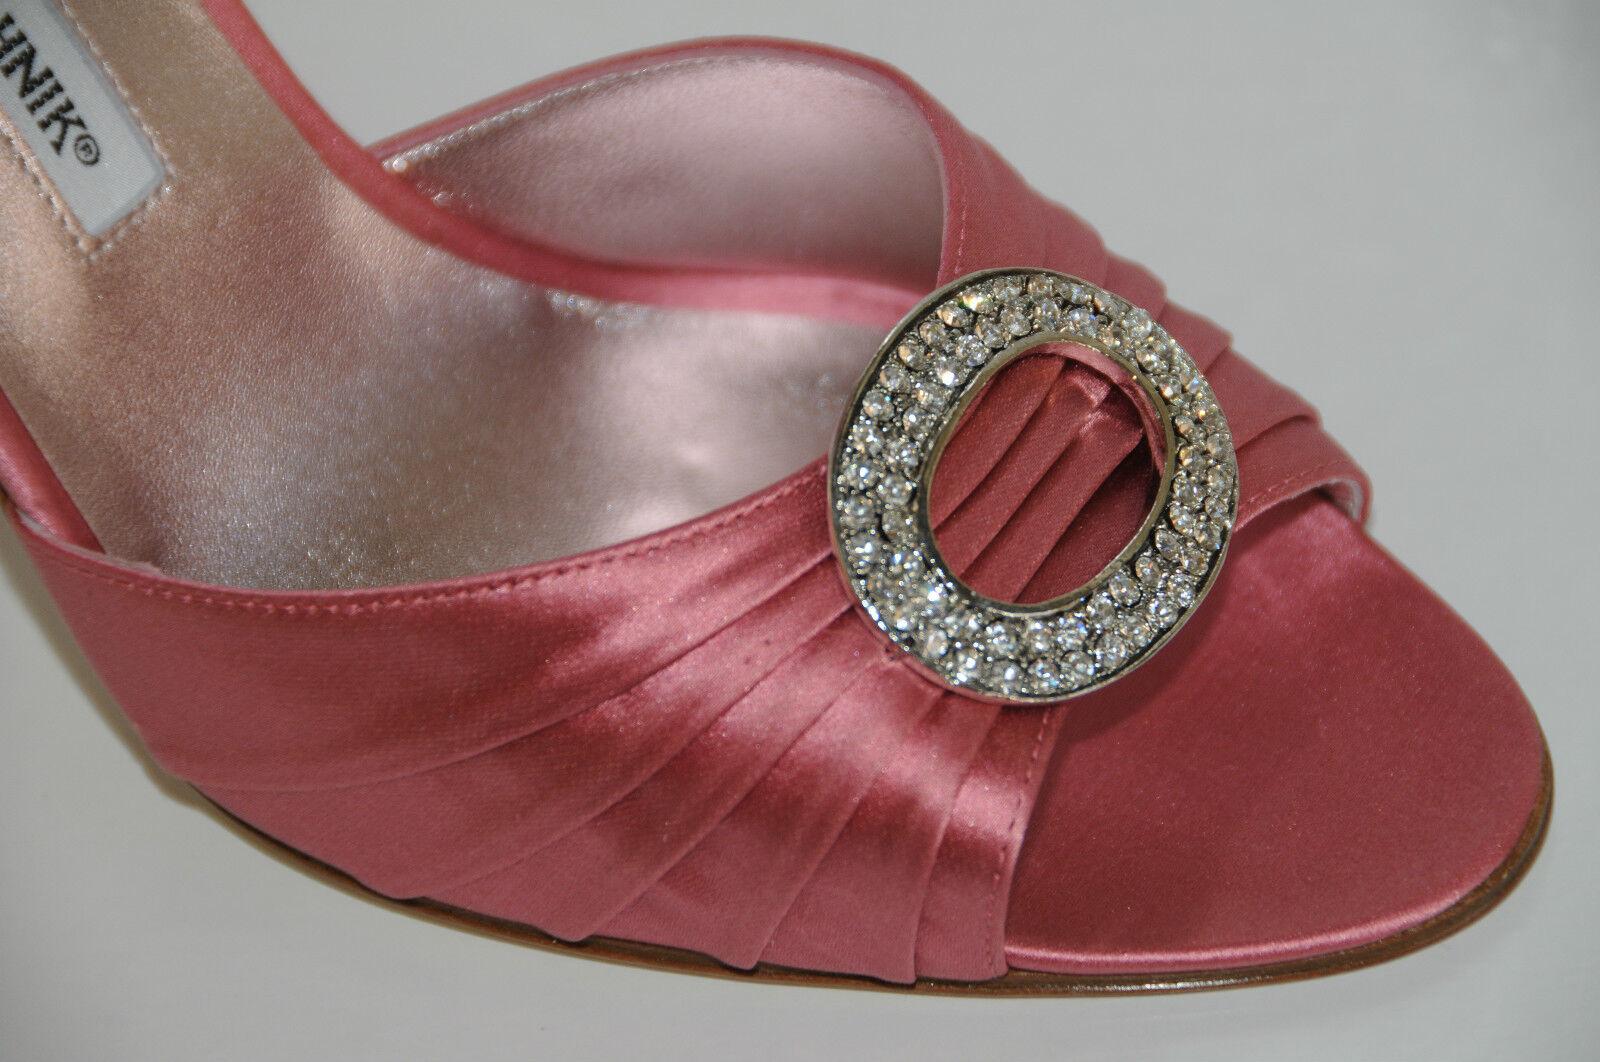 risposte rapide  775 New New New MANOLO BLAHNIK SEDARABY rosa Satin Jeweled Wedding Heels scarpe 41.5 11  fantastica qualità